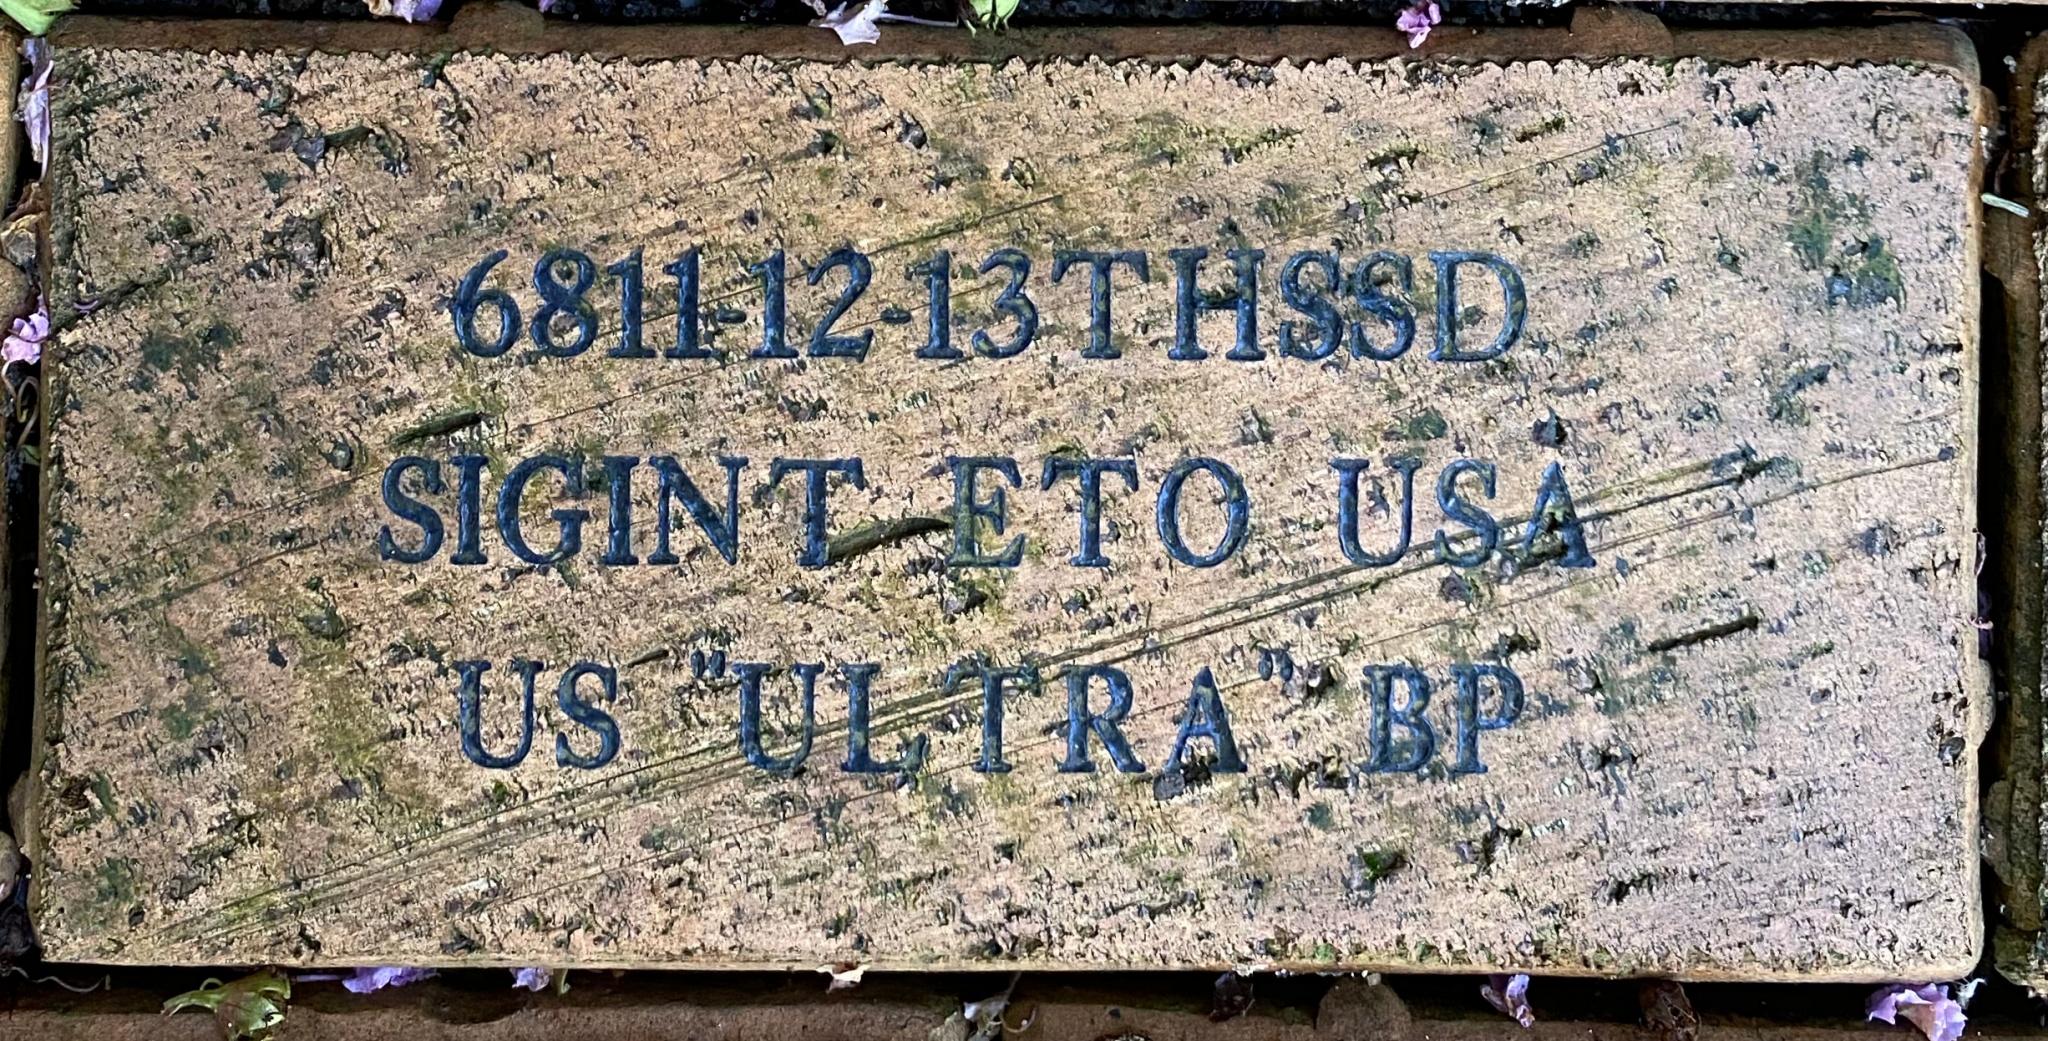 "6811-12-1THSSD SIGINT ETO USA US """"ULTRA"""" BP"